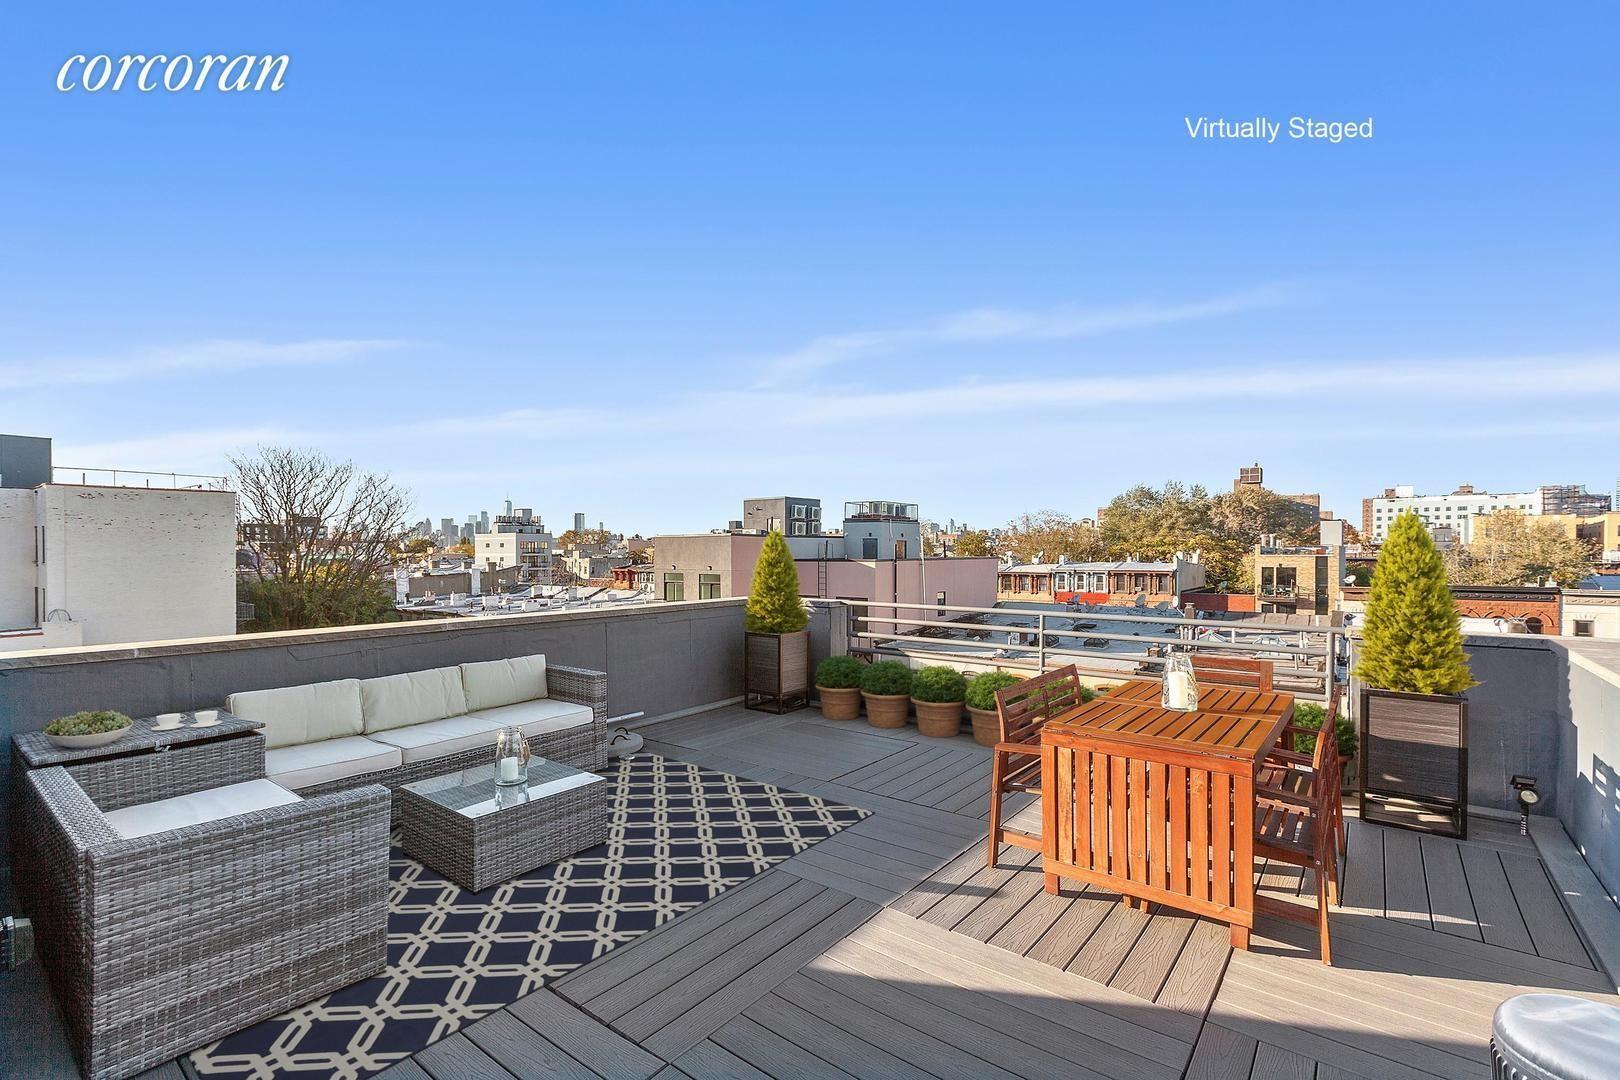 Apartment for sale at 817 Dekalb Avenue, Apt 3